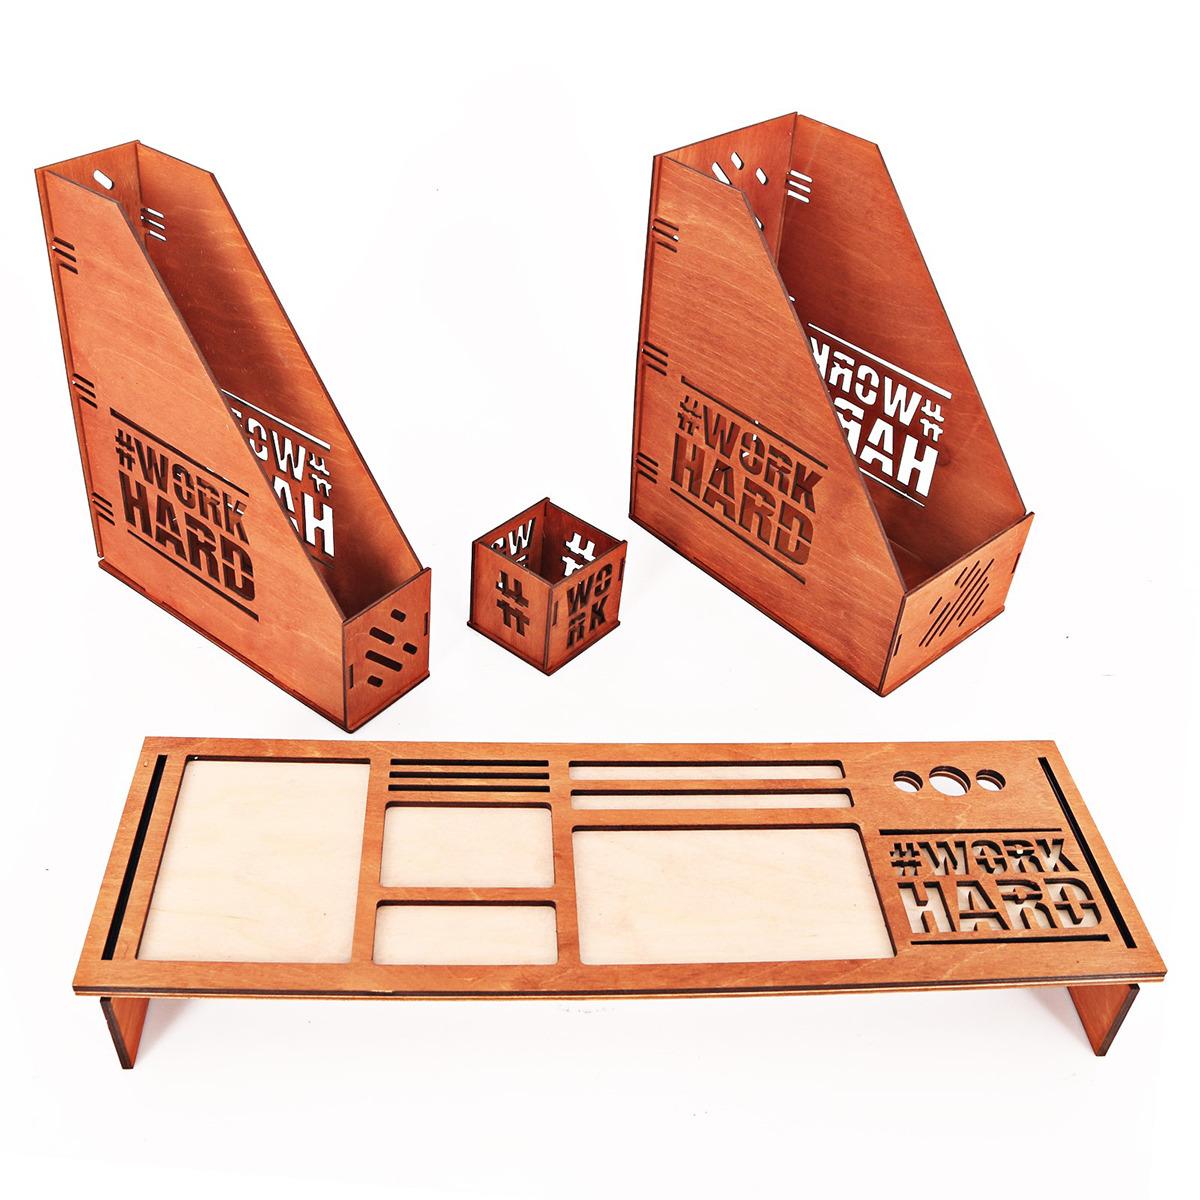 Органайзер для клавиатуры Work Hard, 3680297, коричневый, 54 х 17 х 6,9 см ИП Тропникова Марина Николаевна